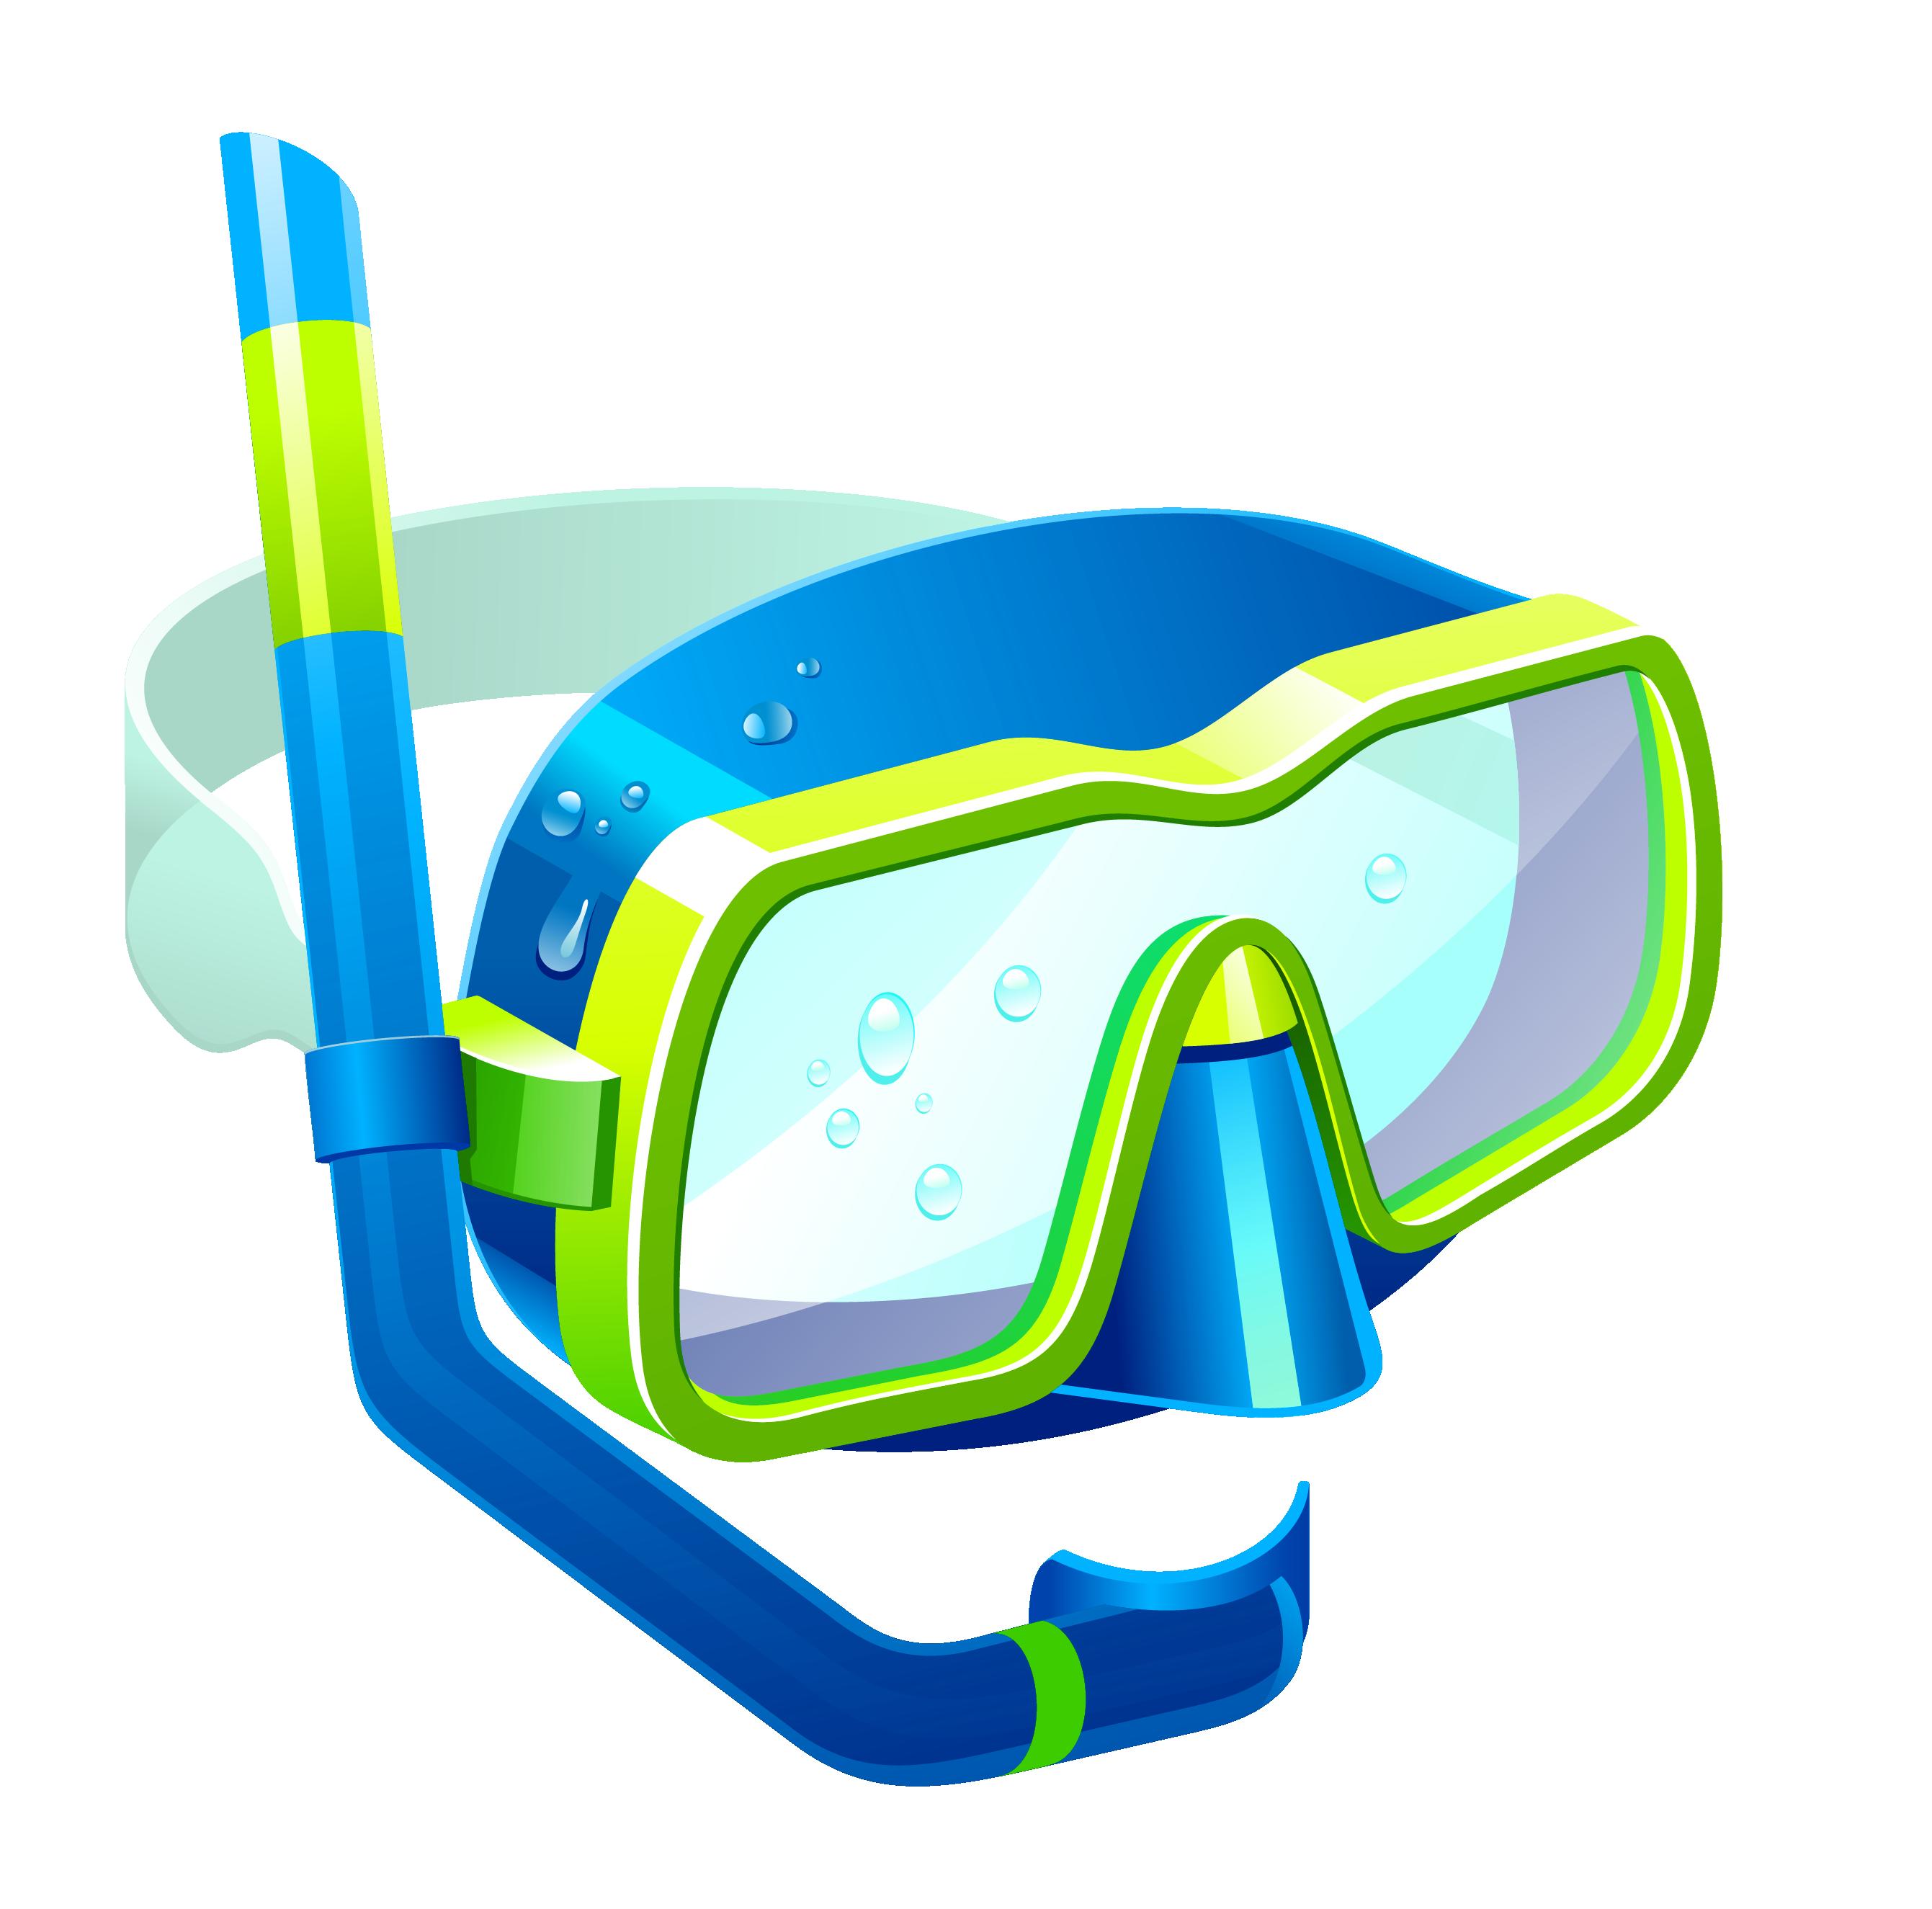 2682x2650 Transparent Blue Snorkel Mask Png Clipartu200b Gallery Yopriceville